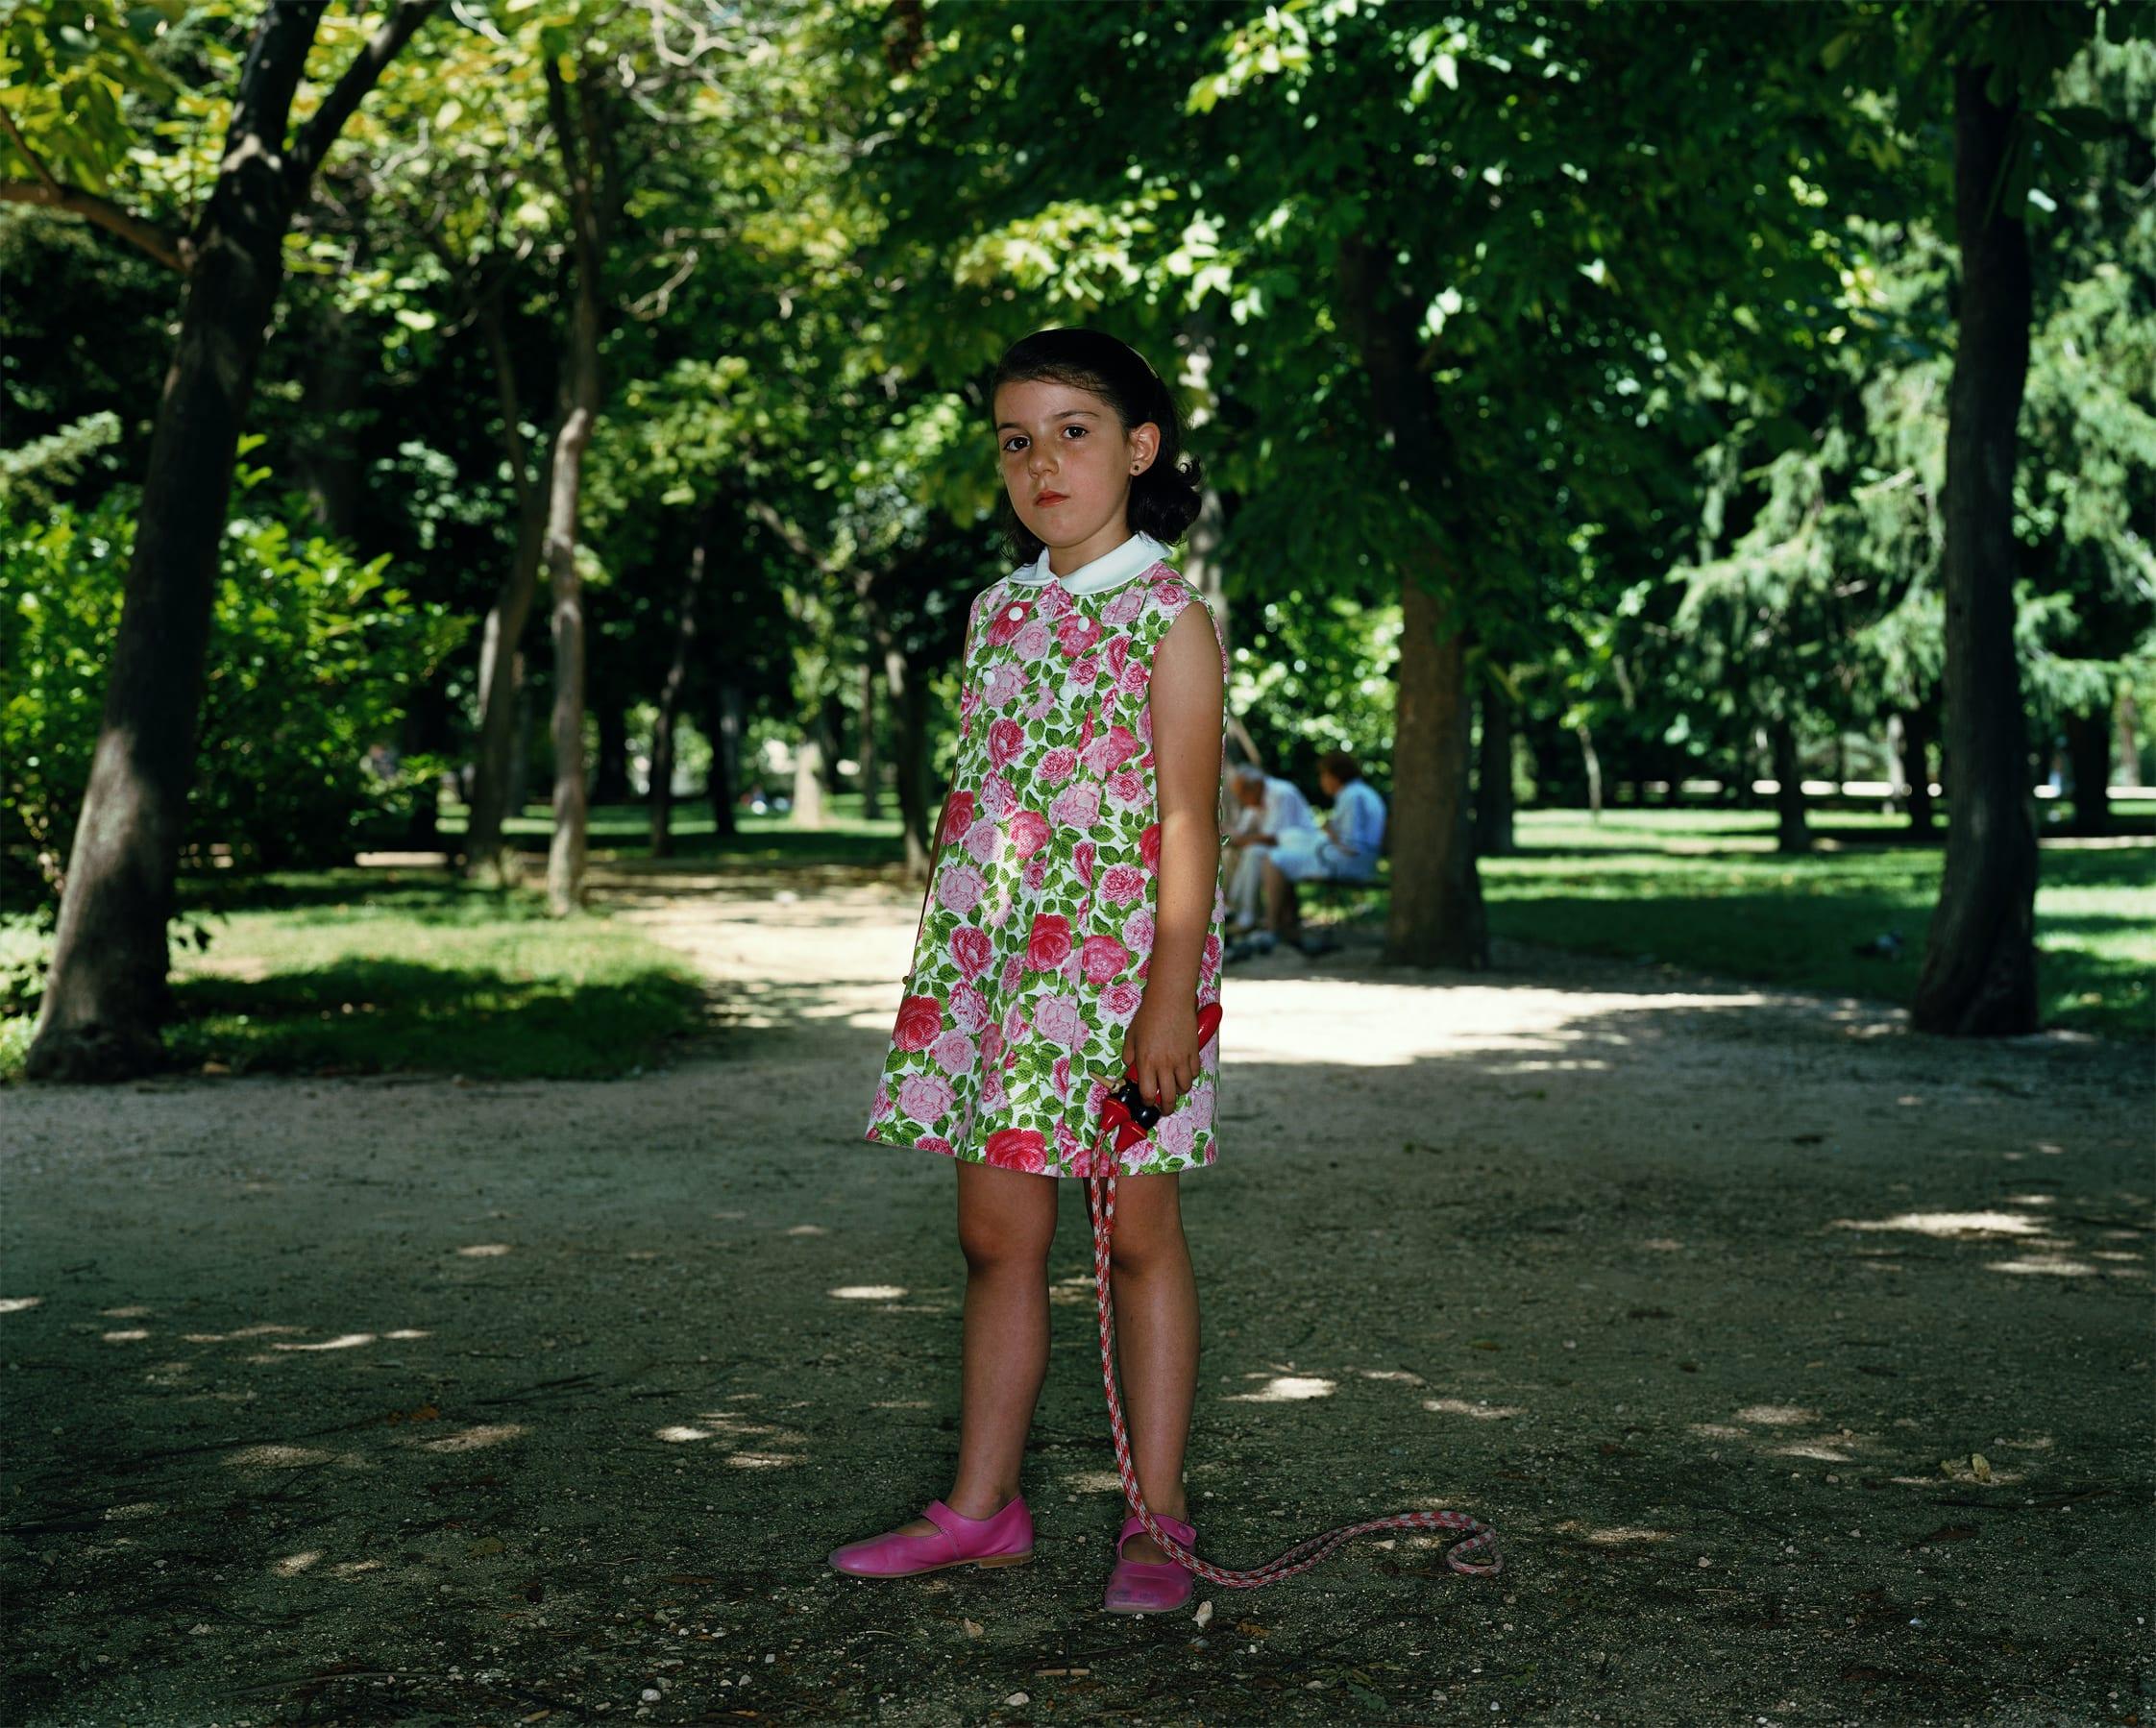 Rineke Dijkstra, El Parque del Retiro, Madrid, July 2, 2006, 2006